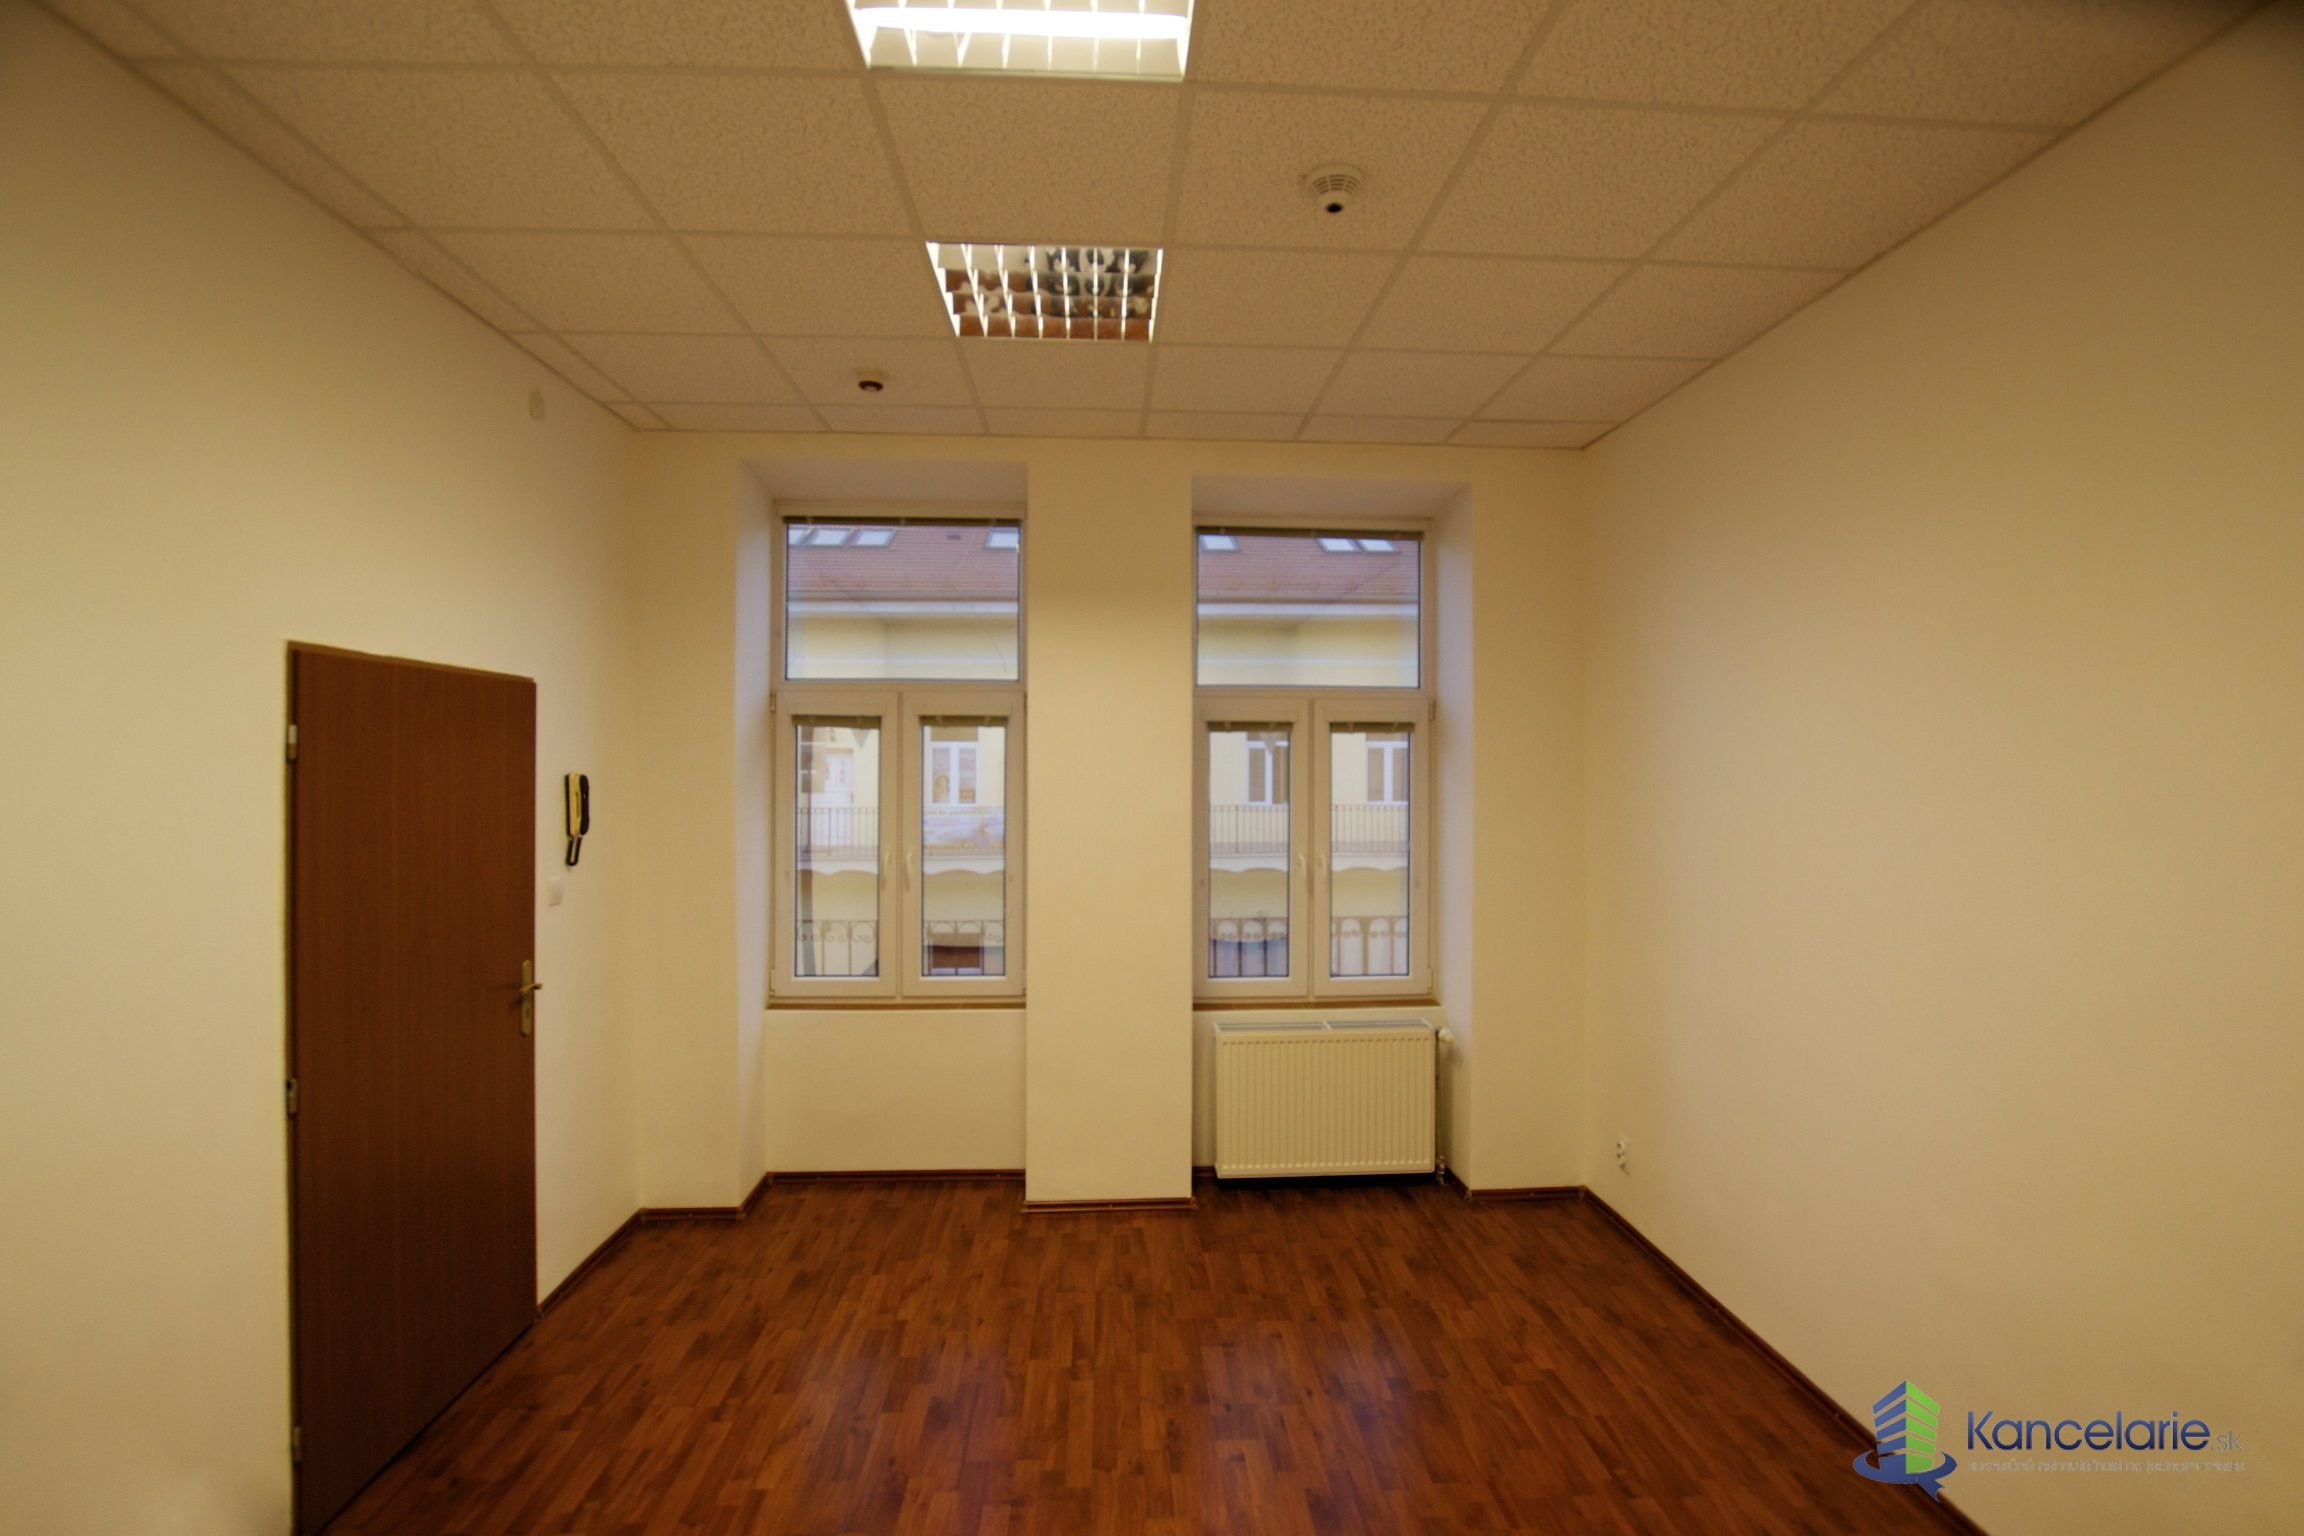 Moyzesova 36, Košice, Moyzesova 36 - 17 m2, Moyzesova 36, Košice